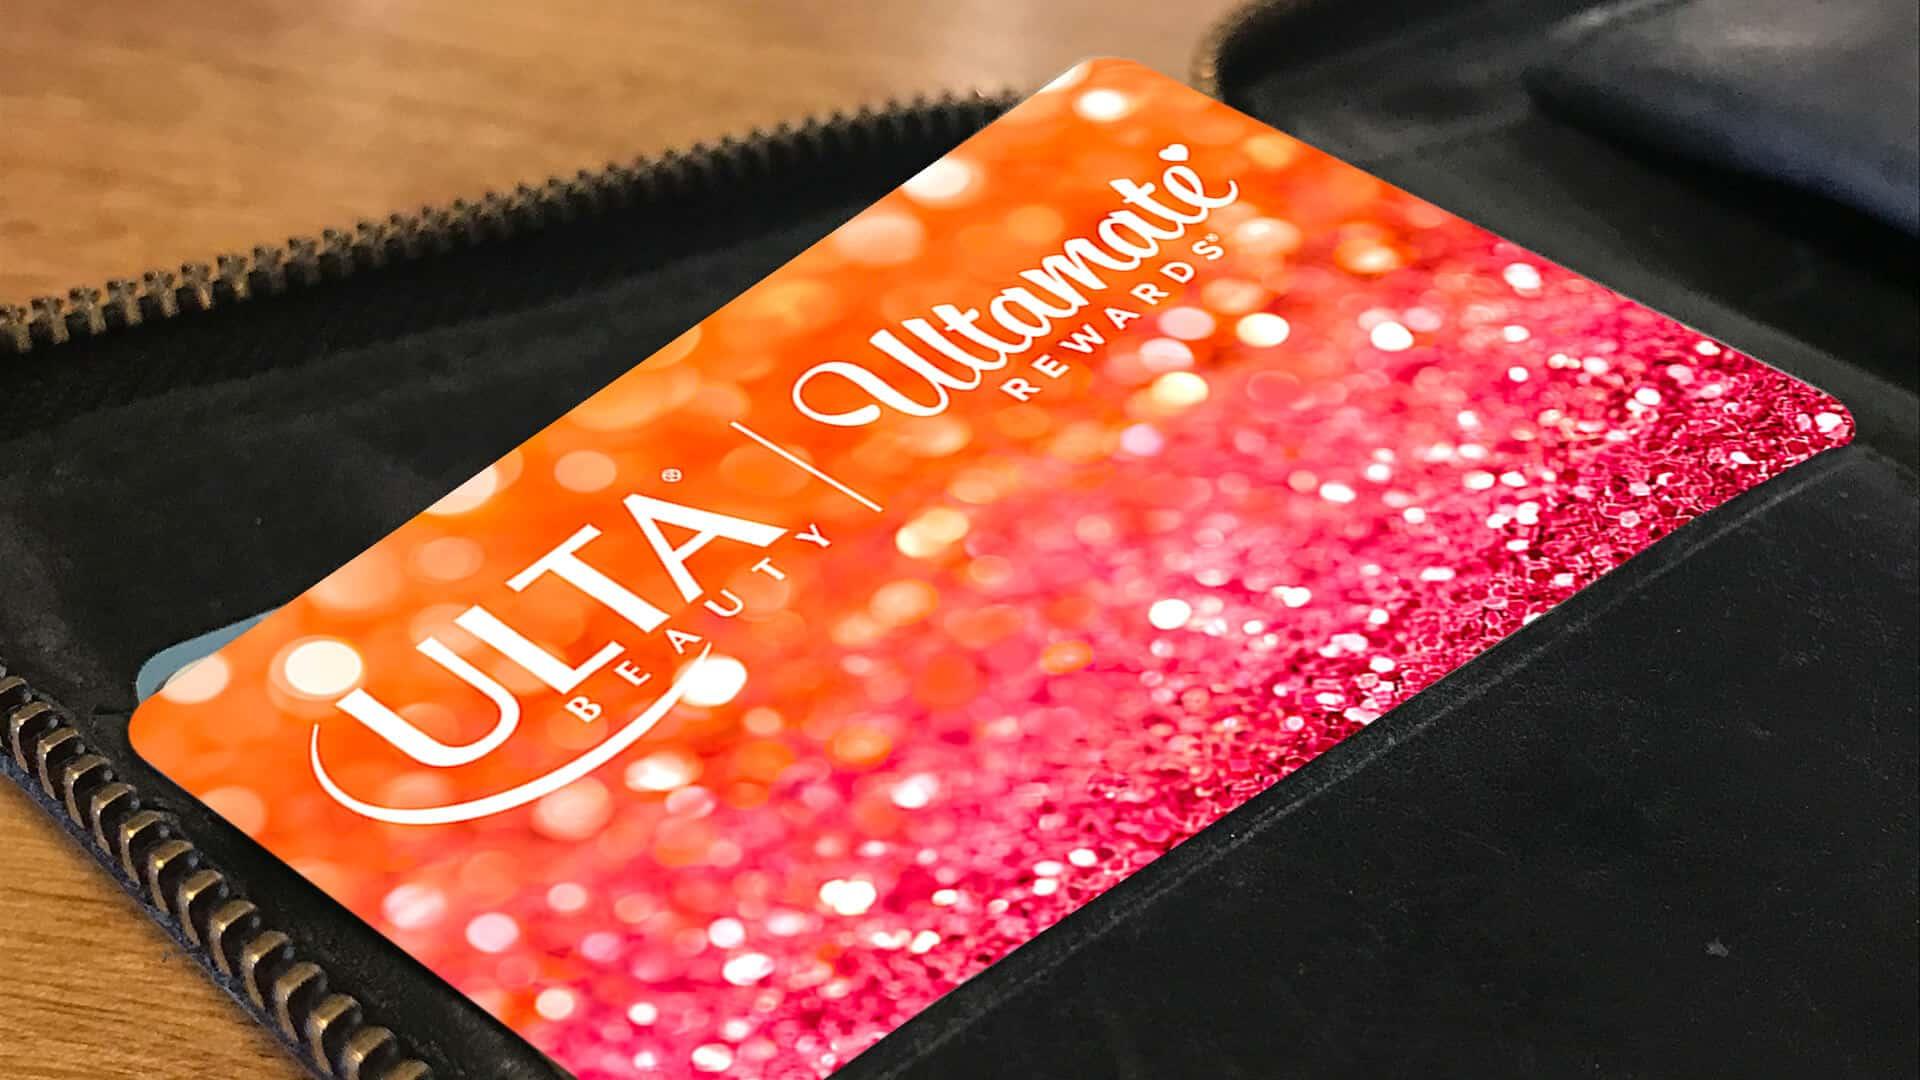 Ulta-Beauty-credit-card